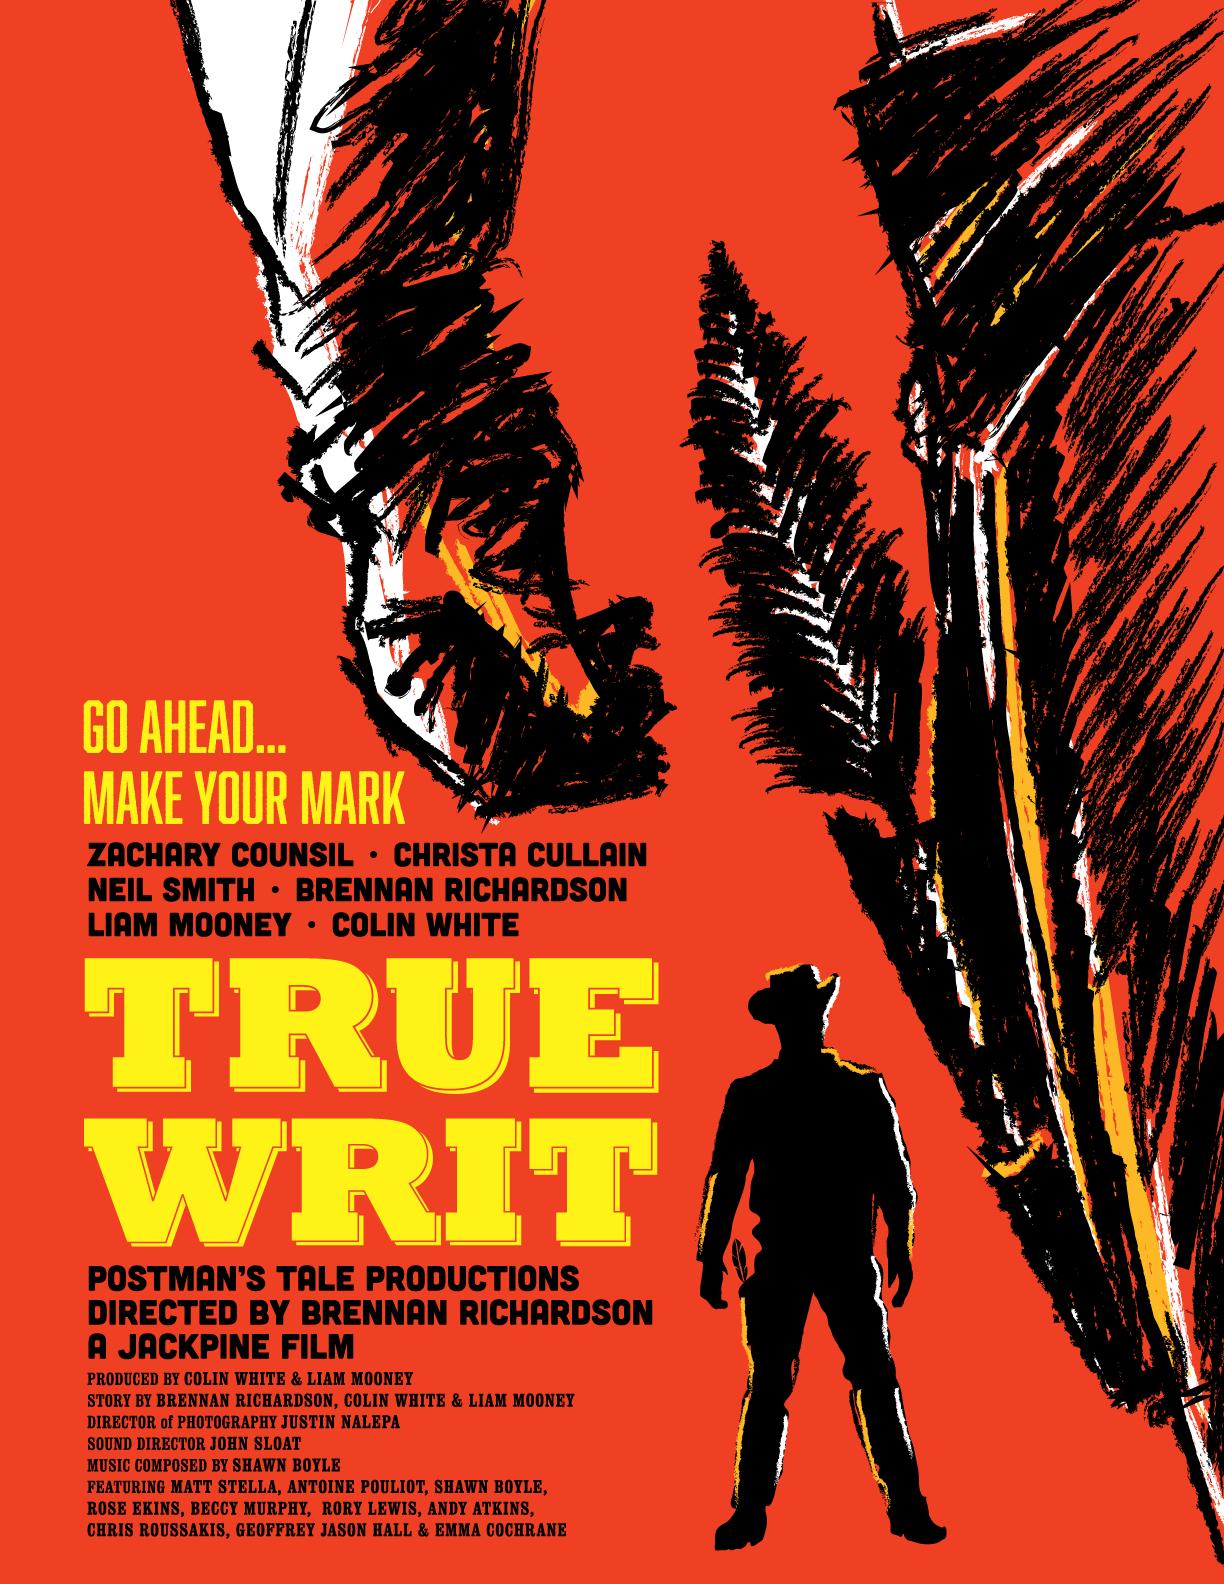 True_Writ_Poster_Final.png